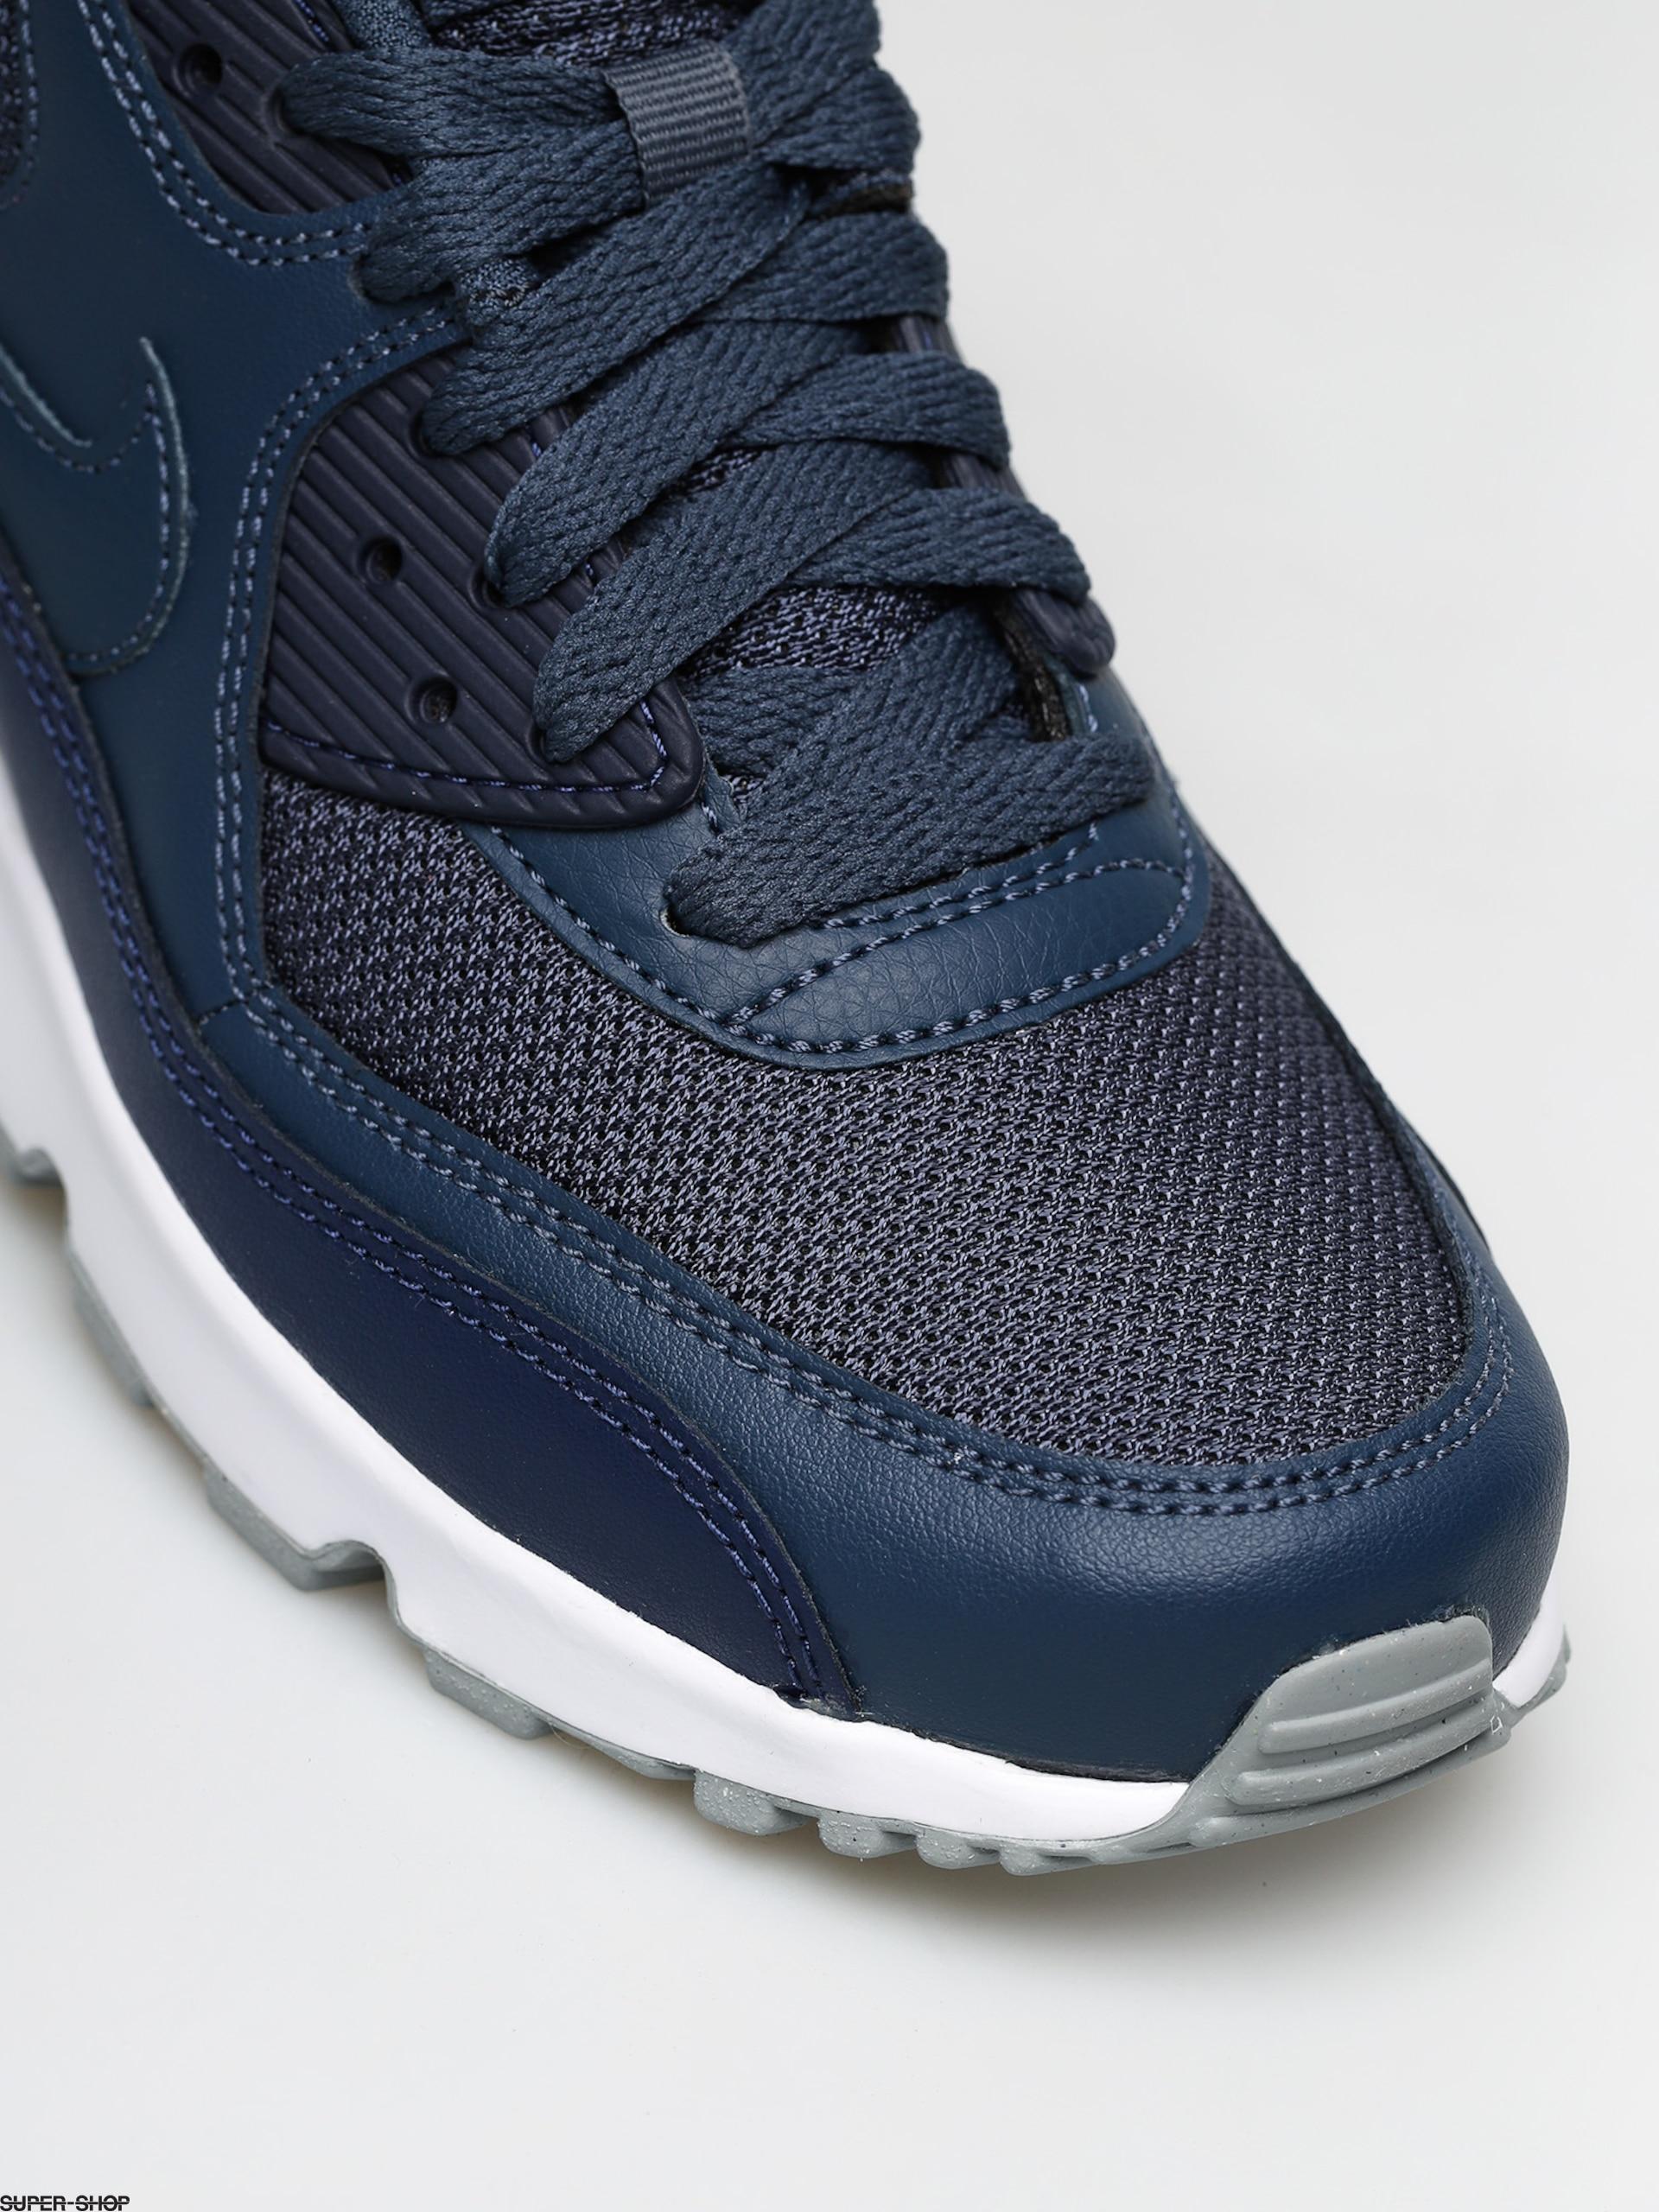 Nike Air Max 90 Mesh (GS) Monsoon Blue Monsoon Blue Midnight Navy   833418 410